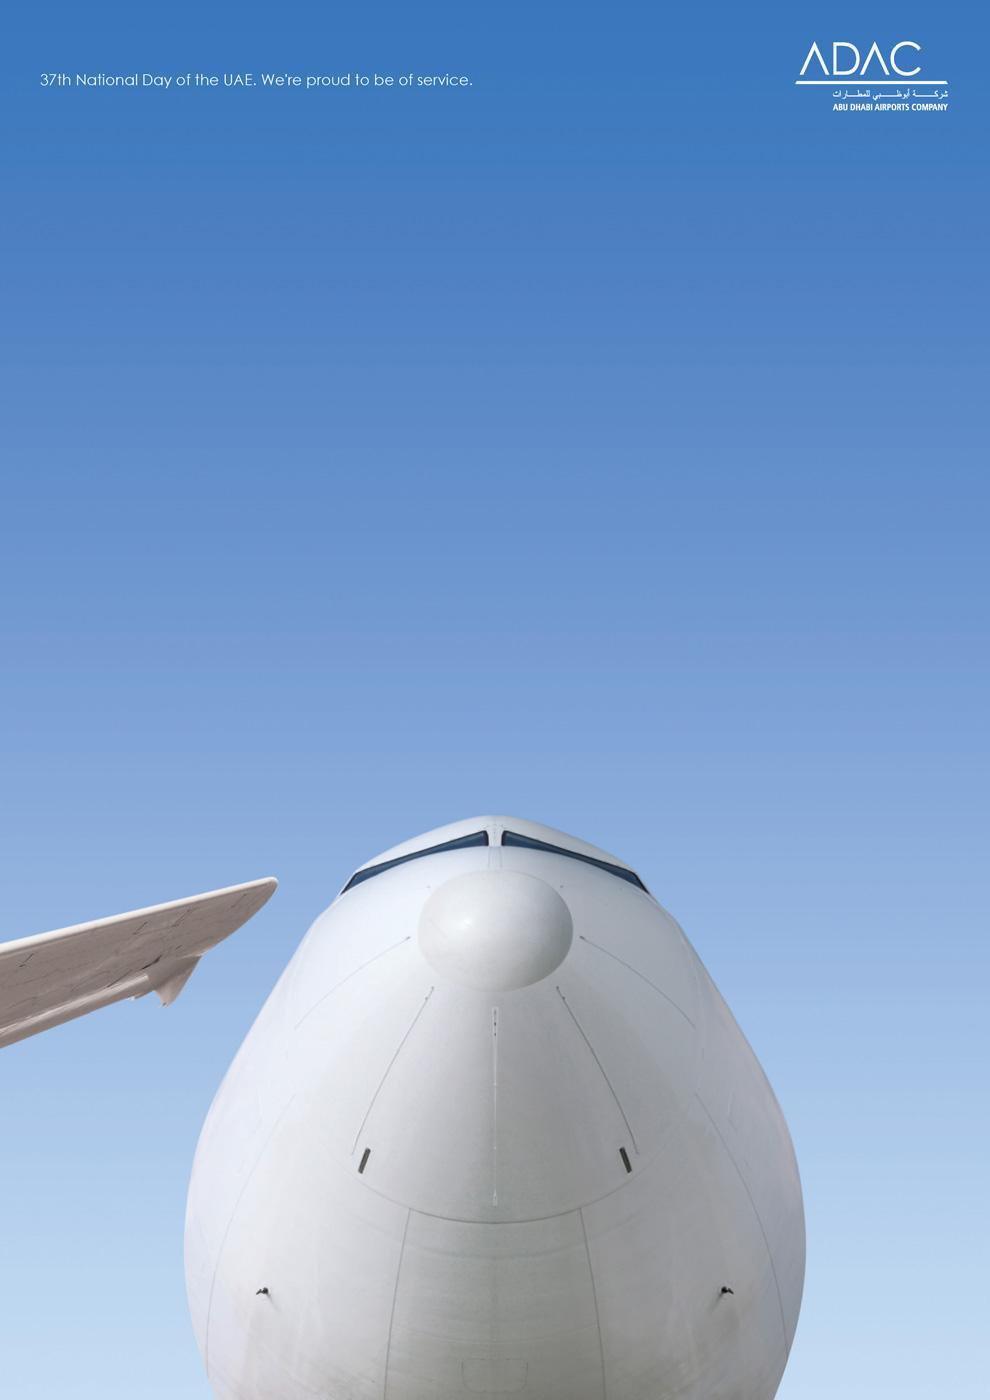 Abu Dhabi Airports Company Print Ad -  Salute